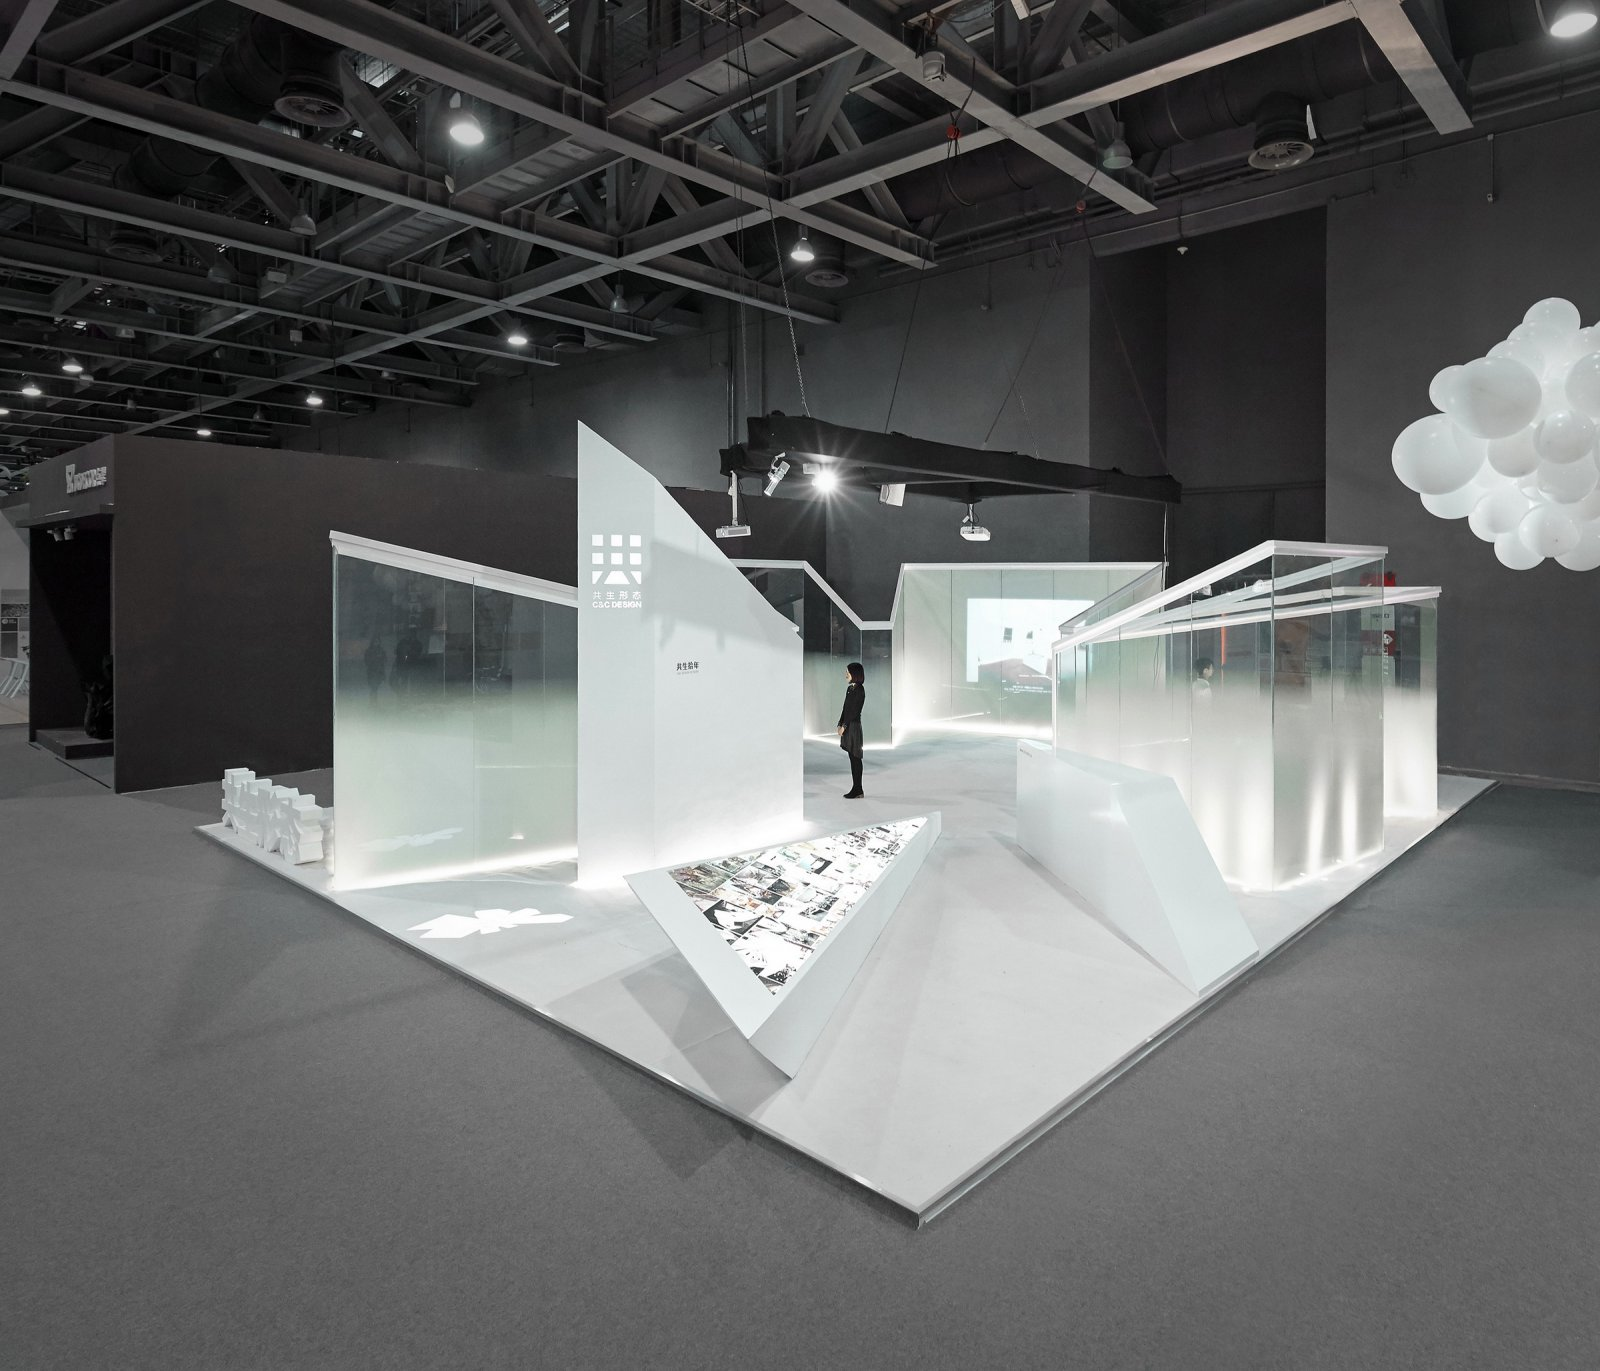 Project Image_彭征_霾——2015年廣州設計周共生形態館.jpg